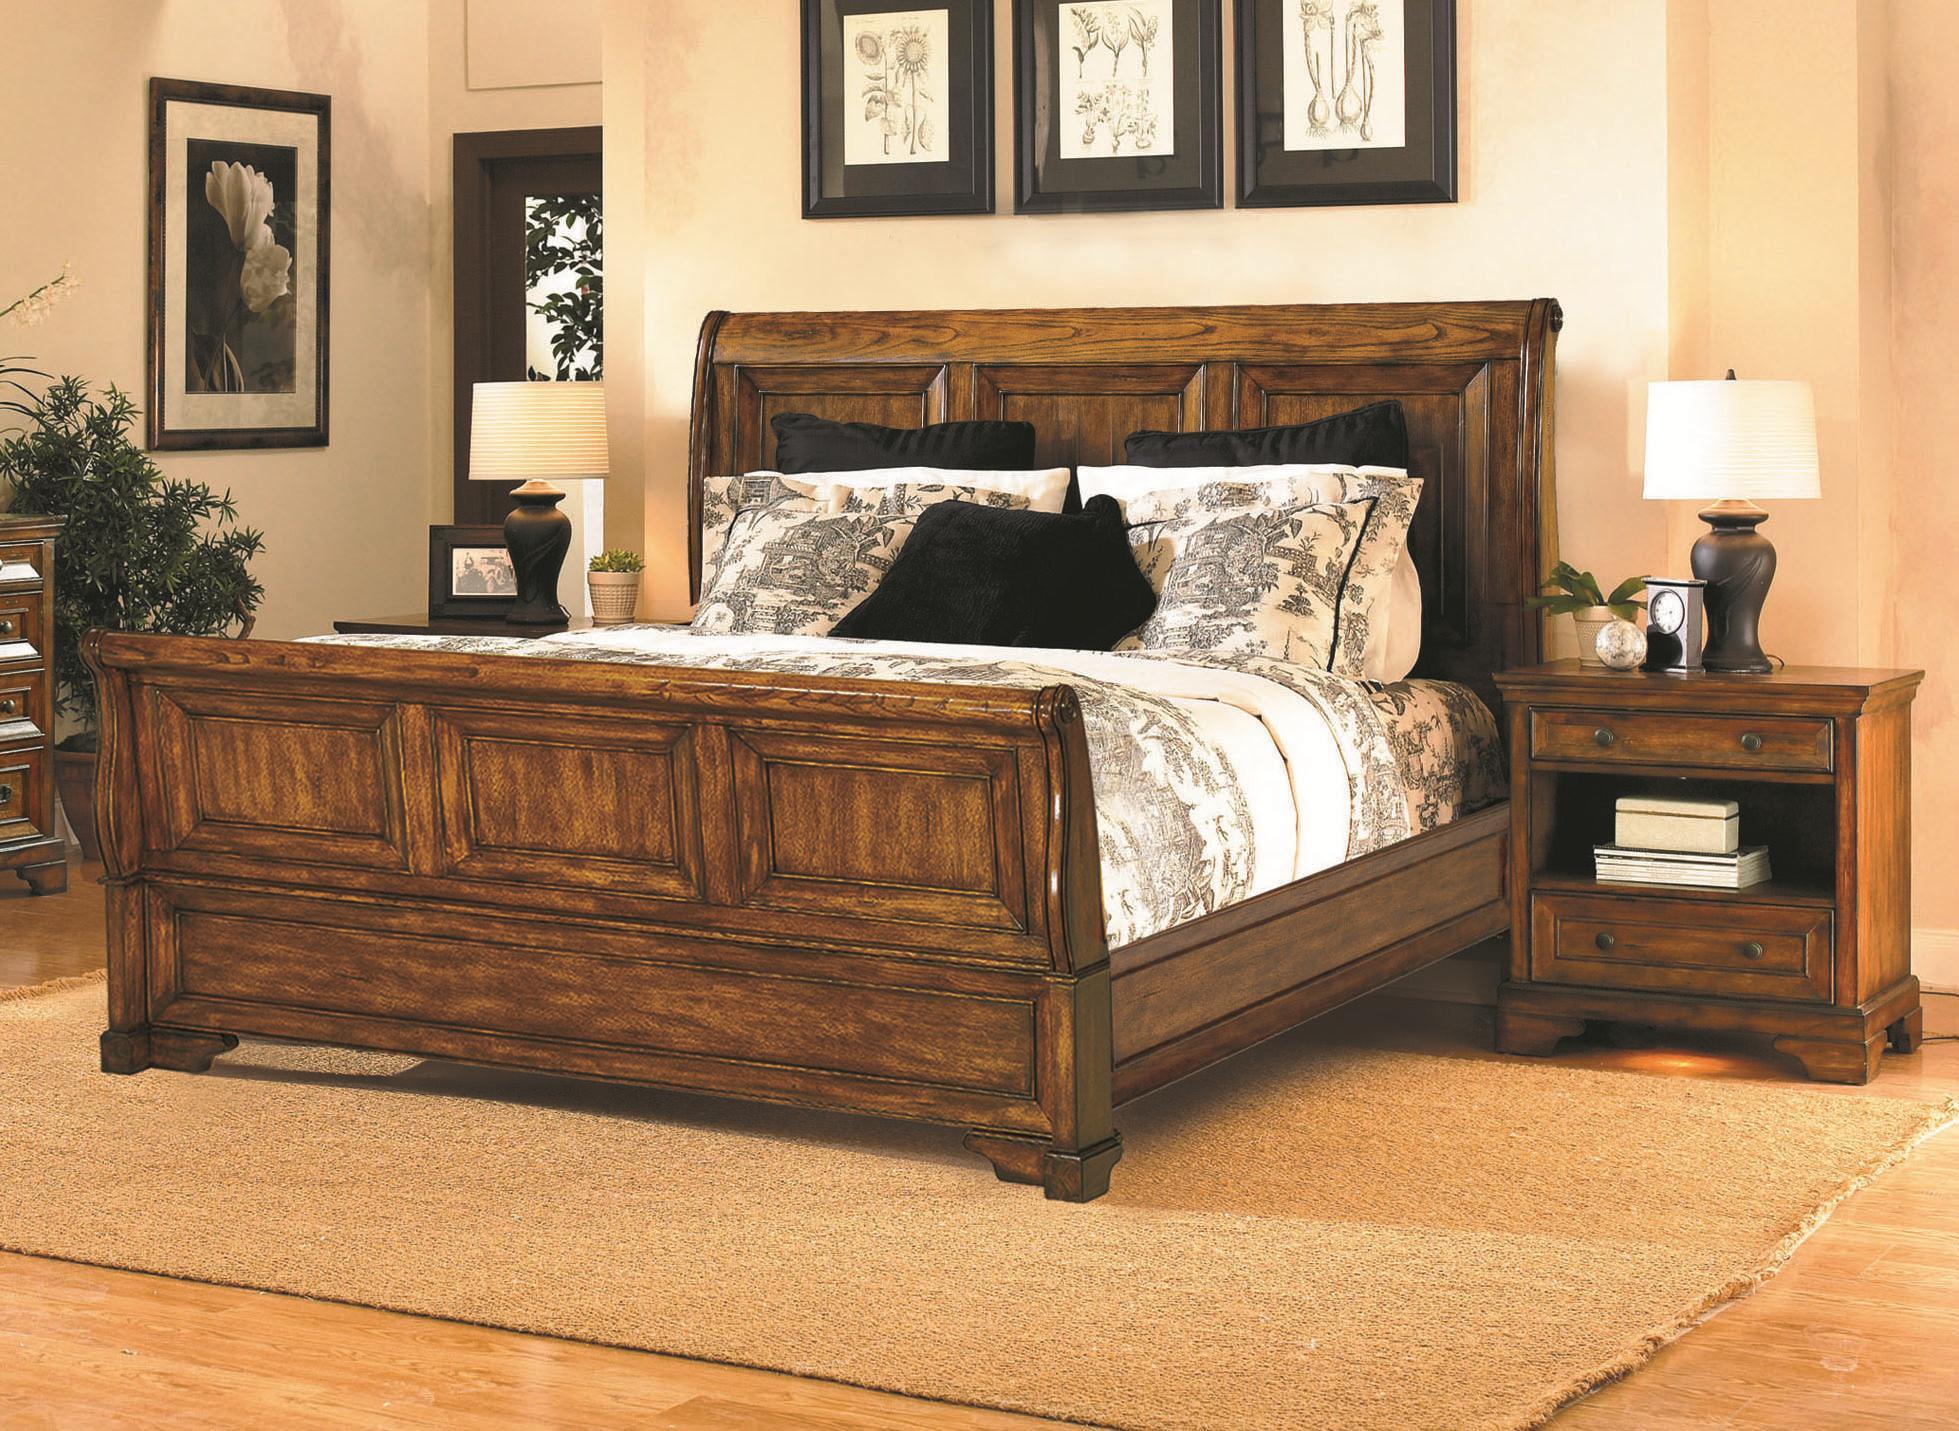 Aspenhome centennial king bedroom group stoney creek for Stoney creek bedroom set